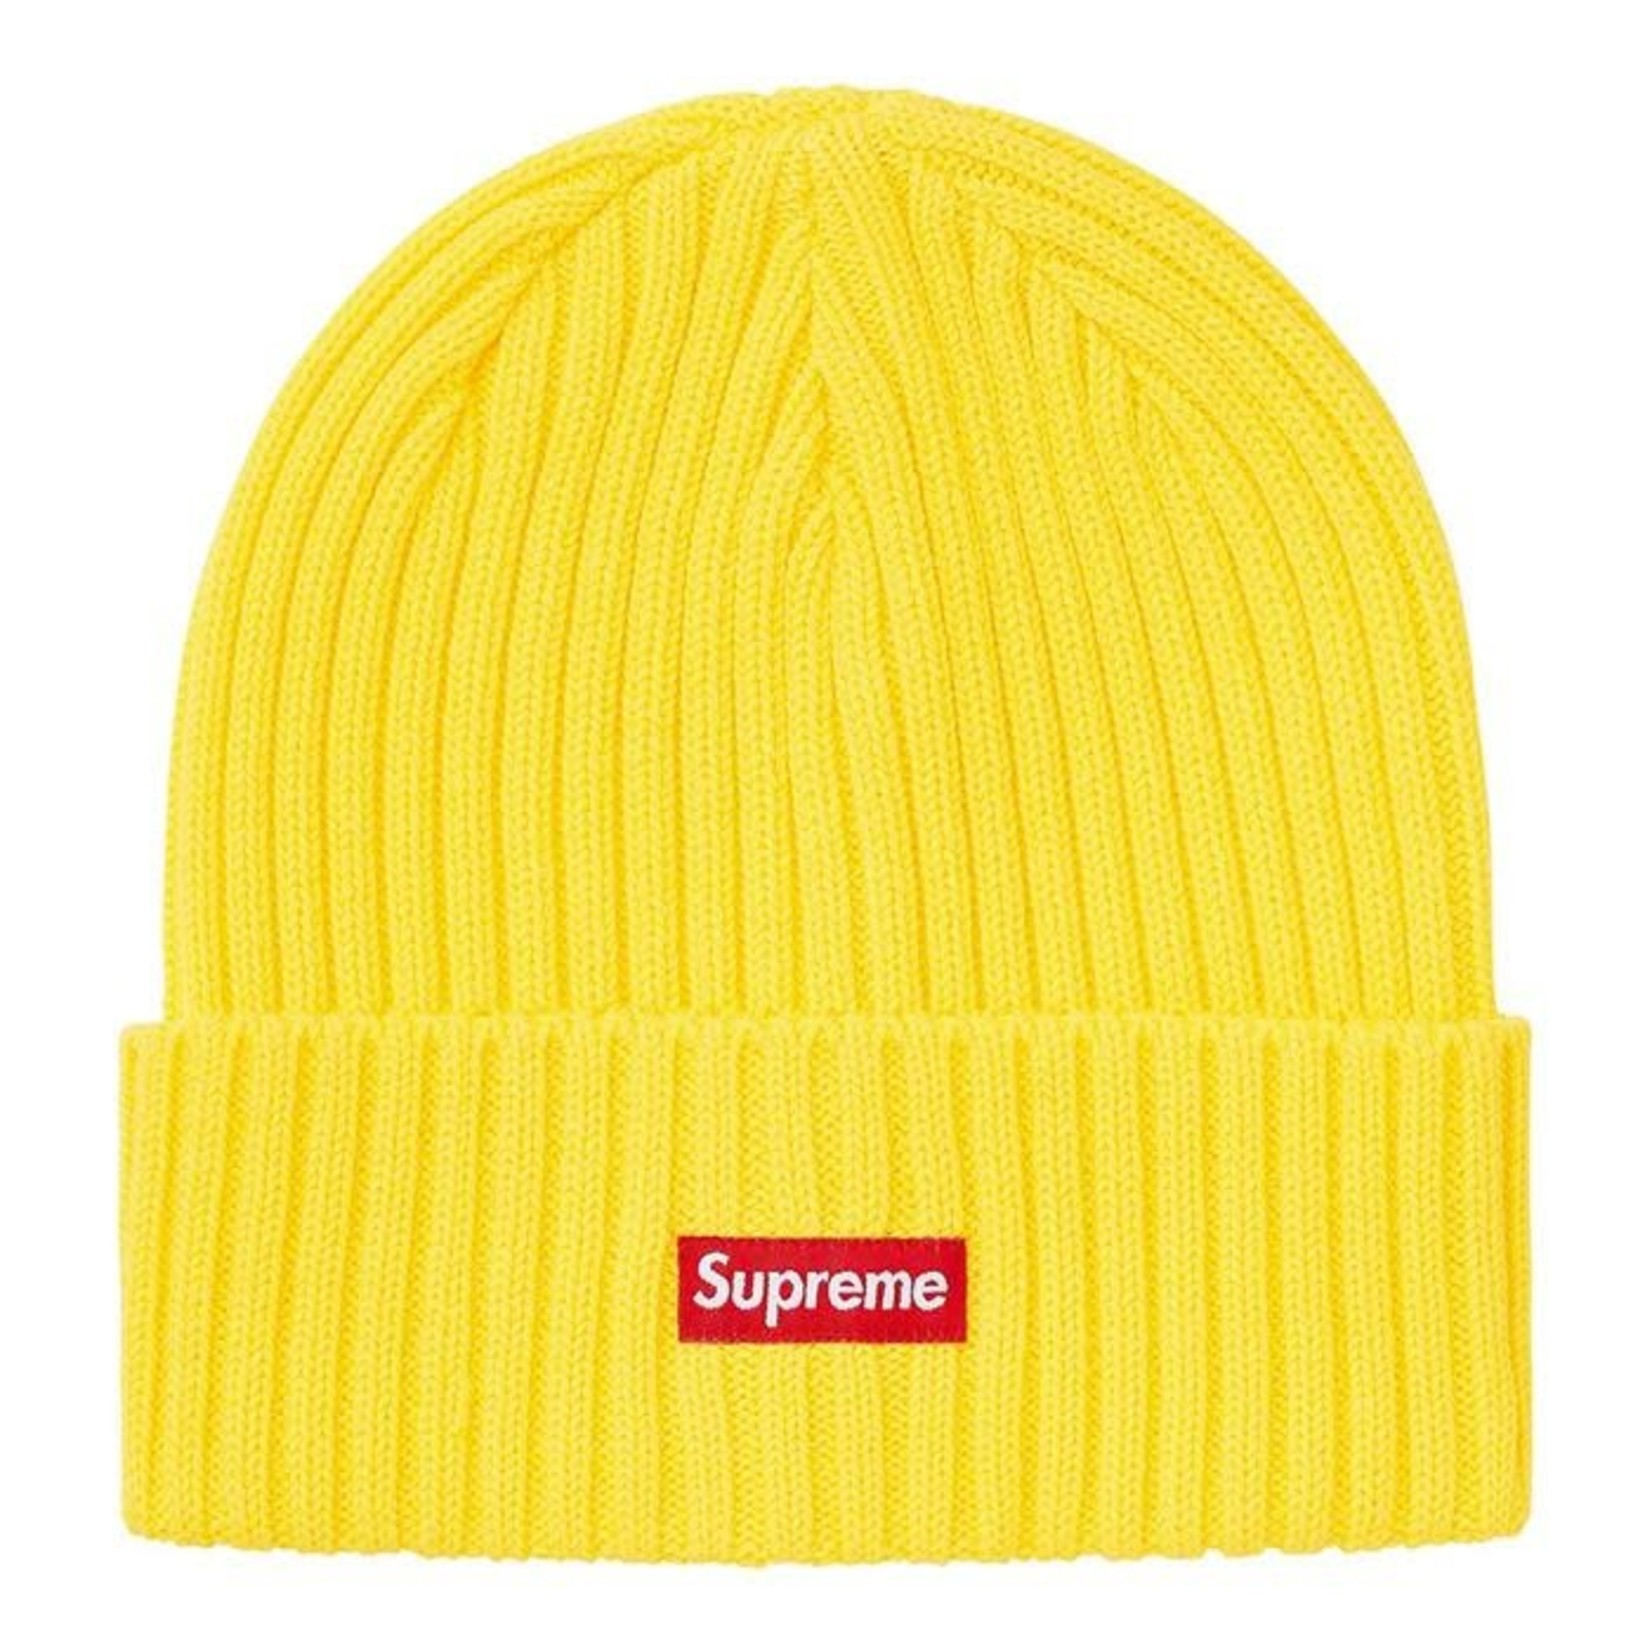 Supreme Supreme Overdyed Beanie (C)